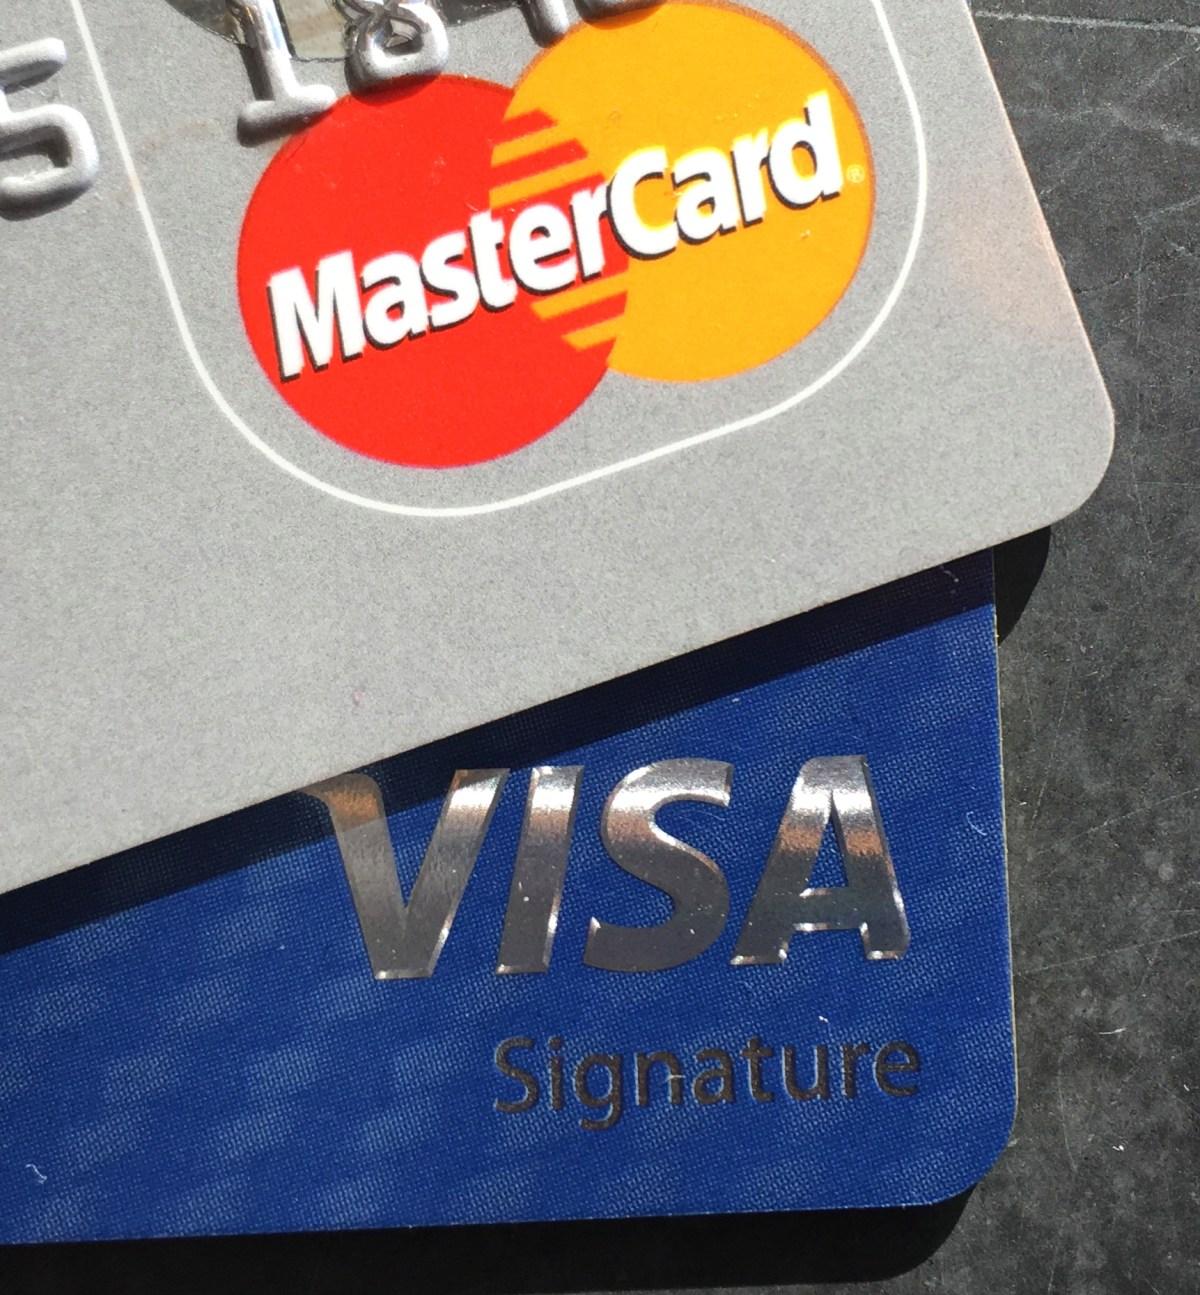 visa and mastercard logos on edge of credit cards